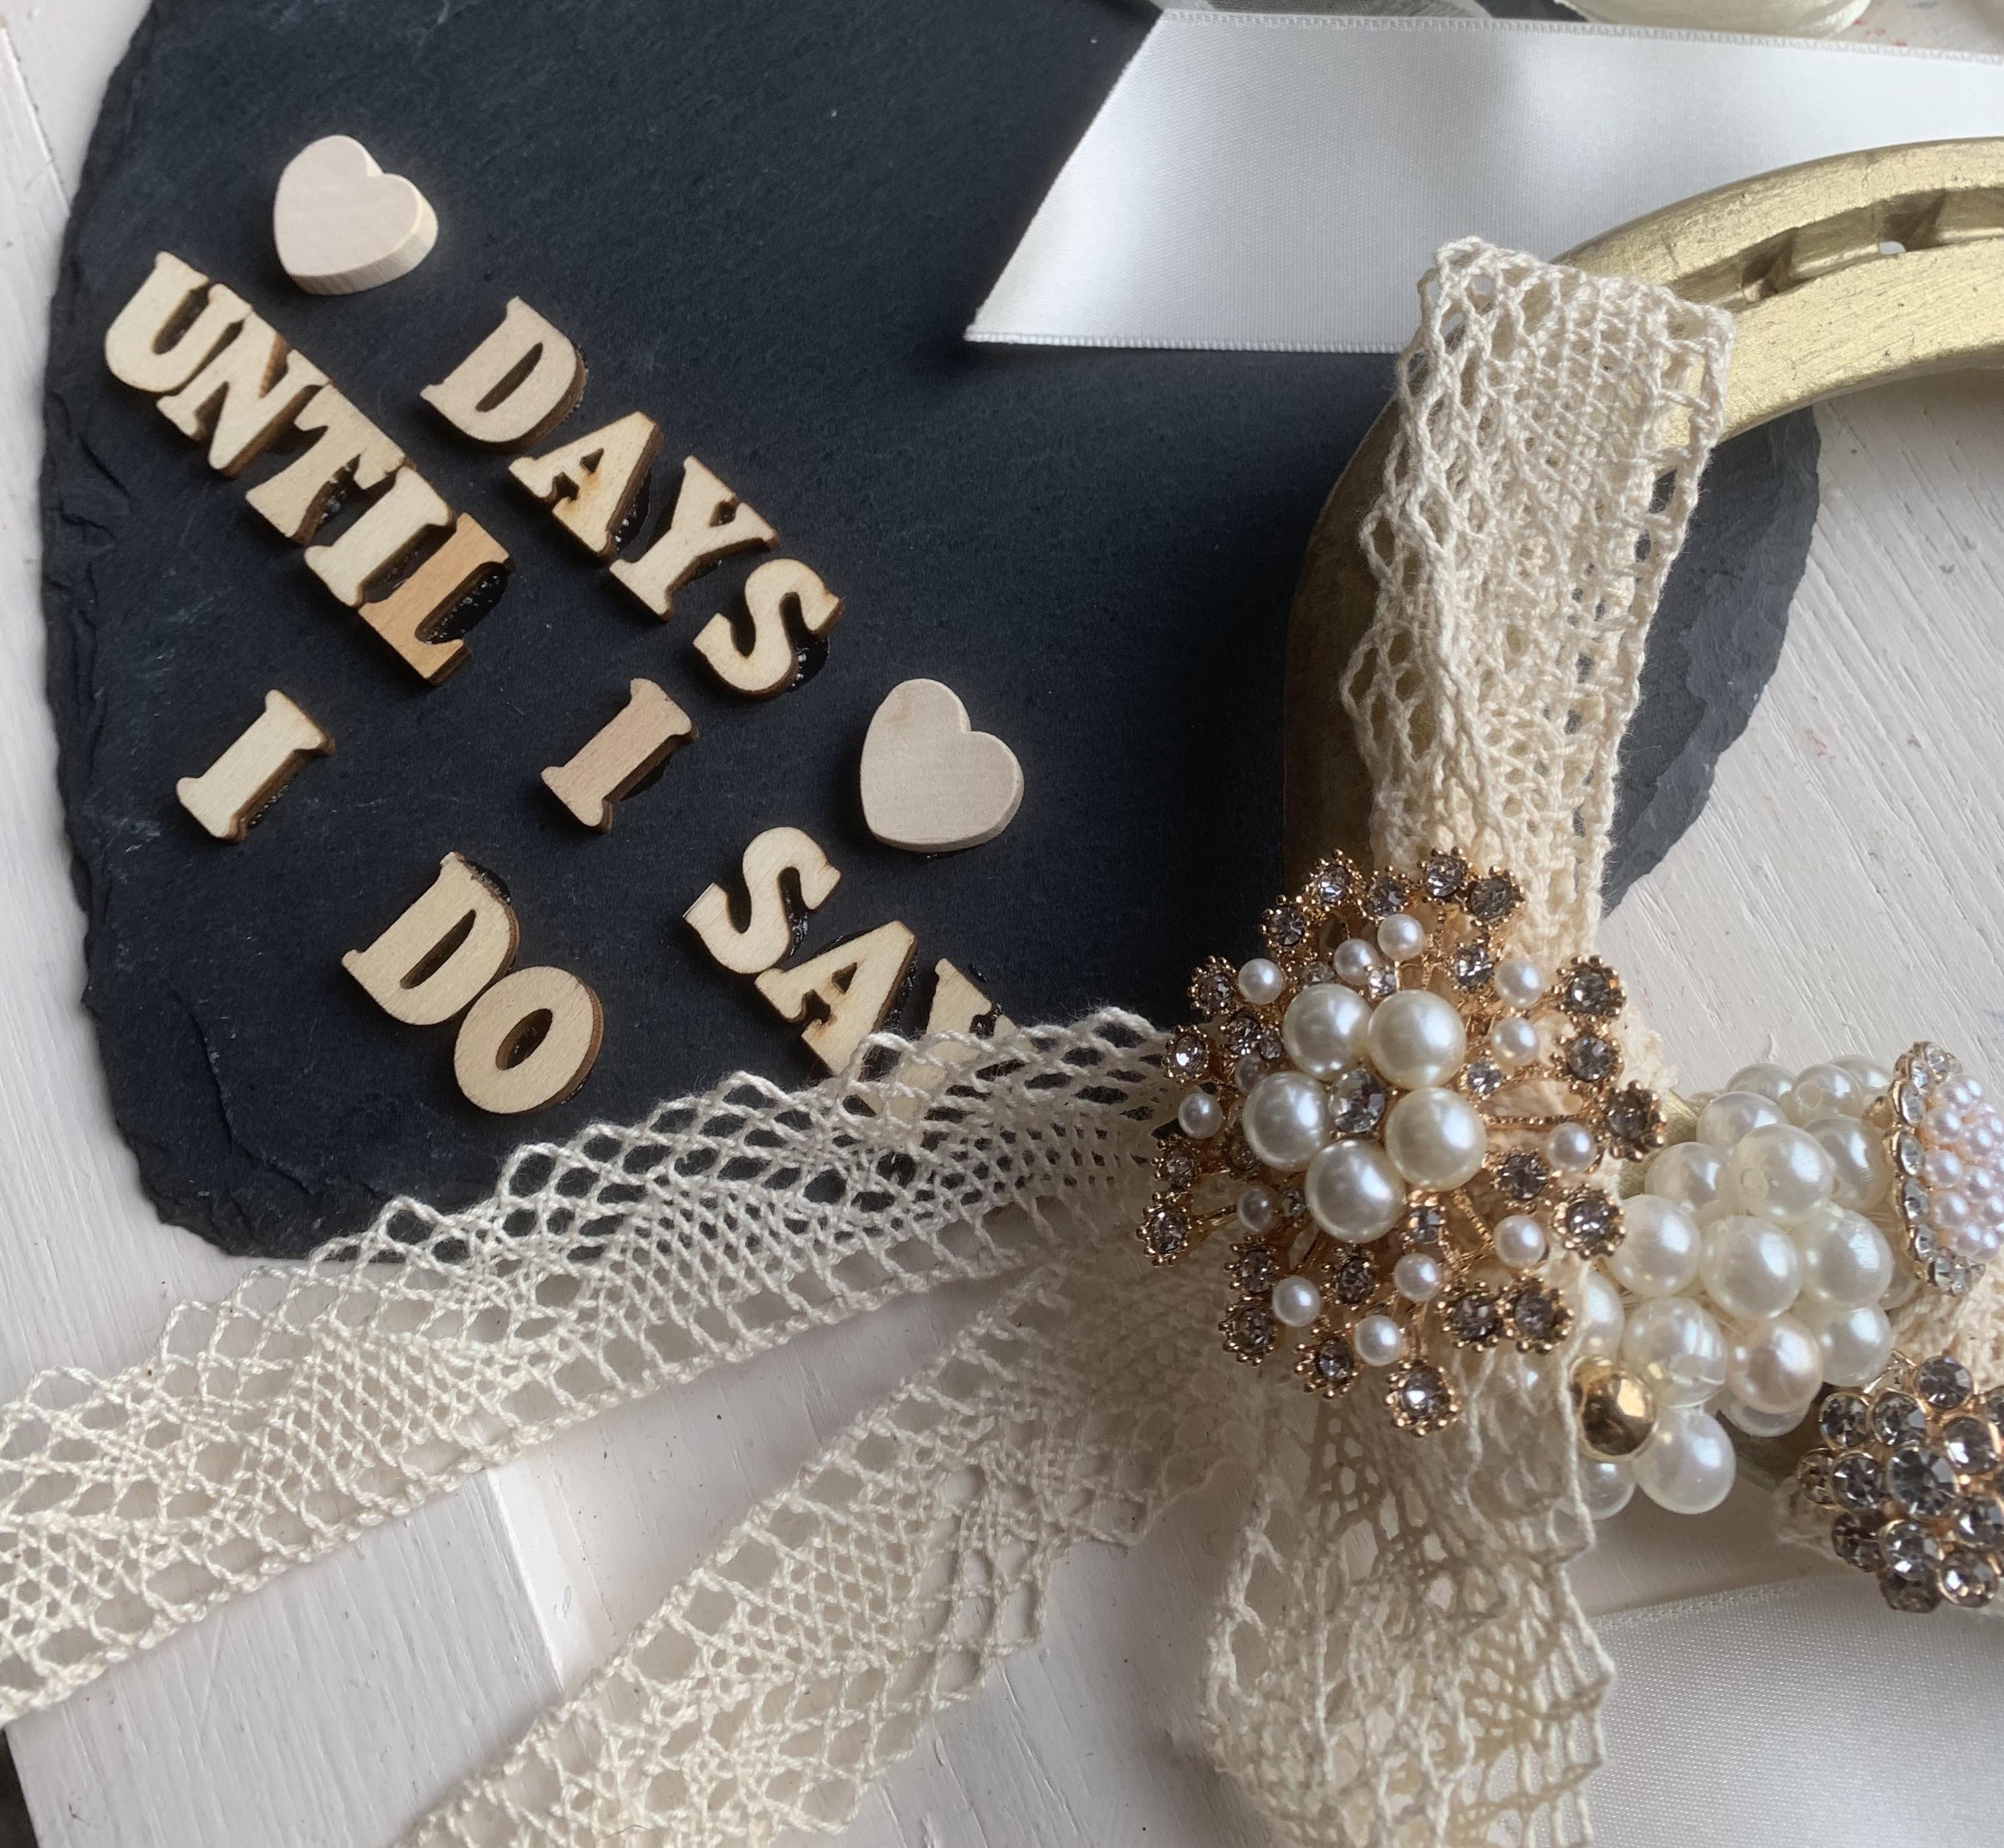 Countdown until your wedding